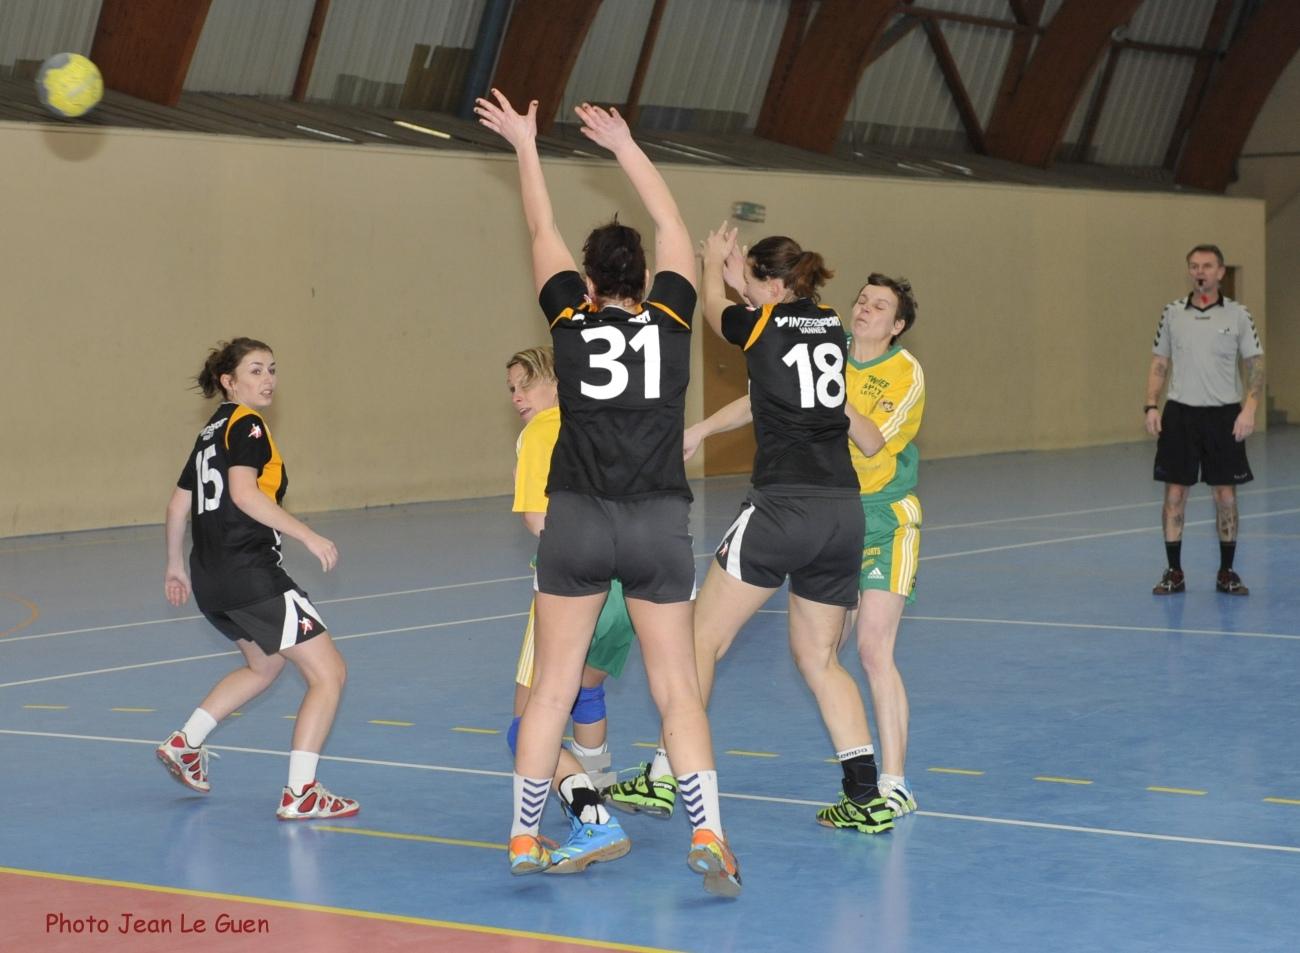 Hbcd 2014 2015 moins de 16 ans hbcd handball club drenn cois - Coupe de bretagne seniors ...